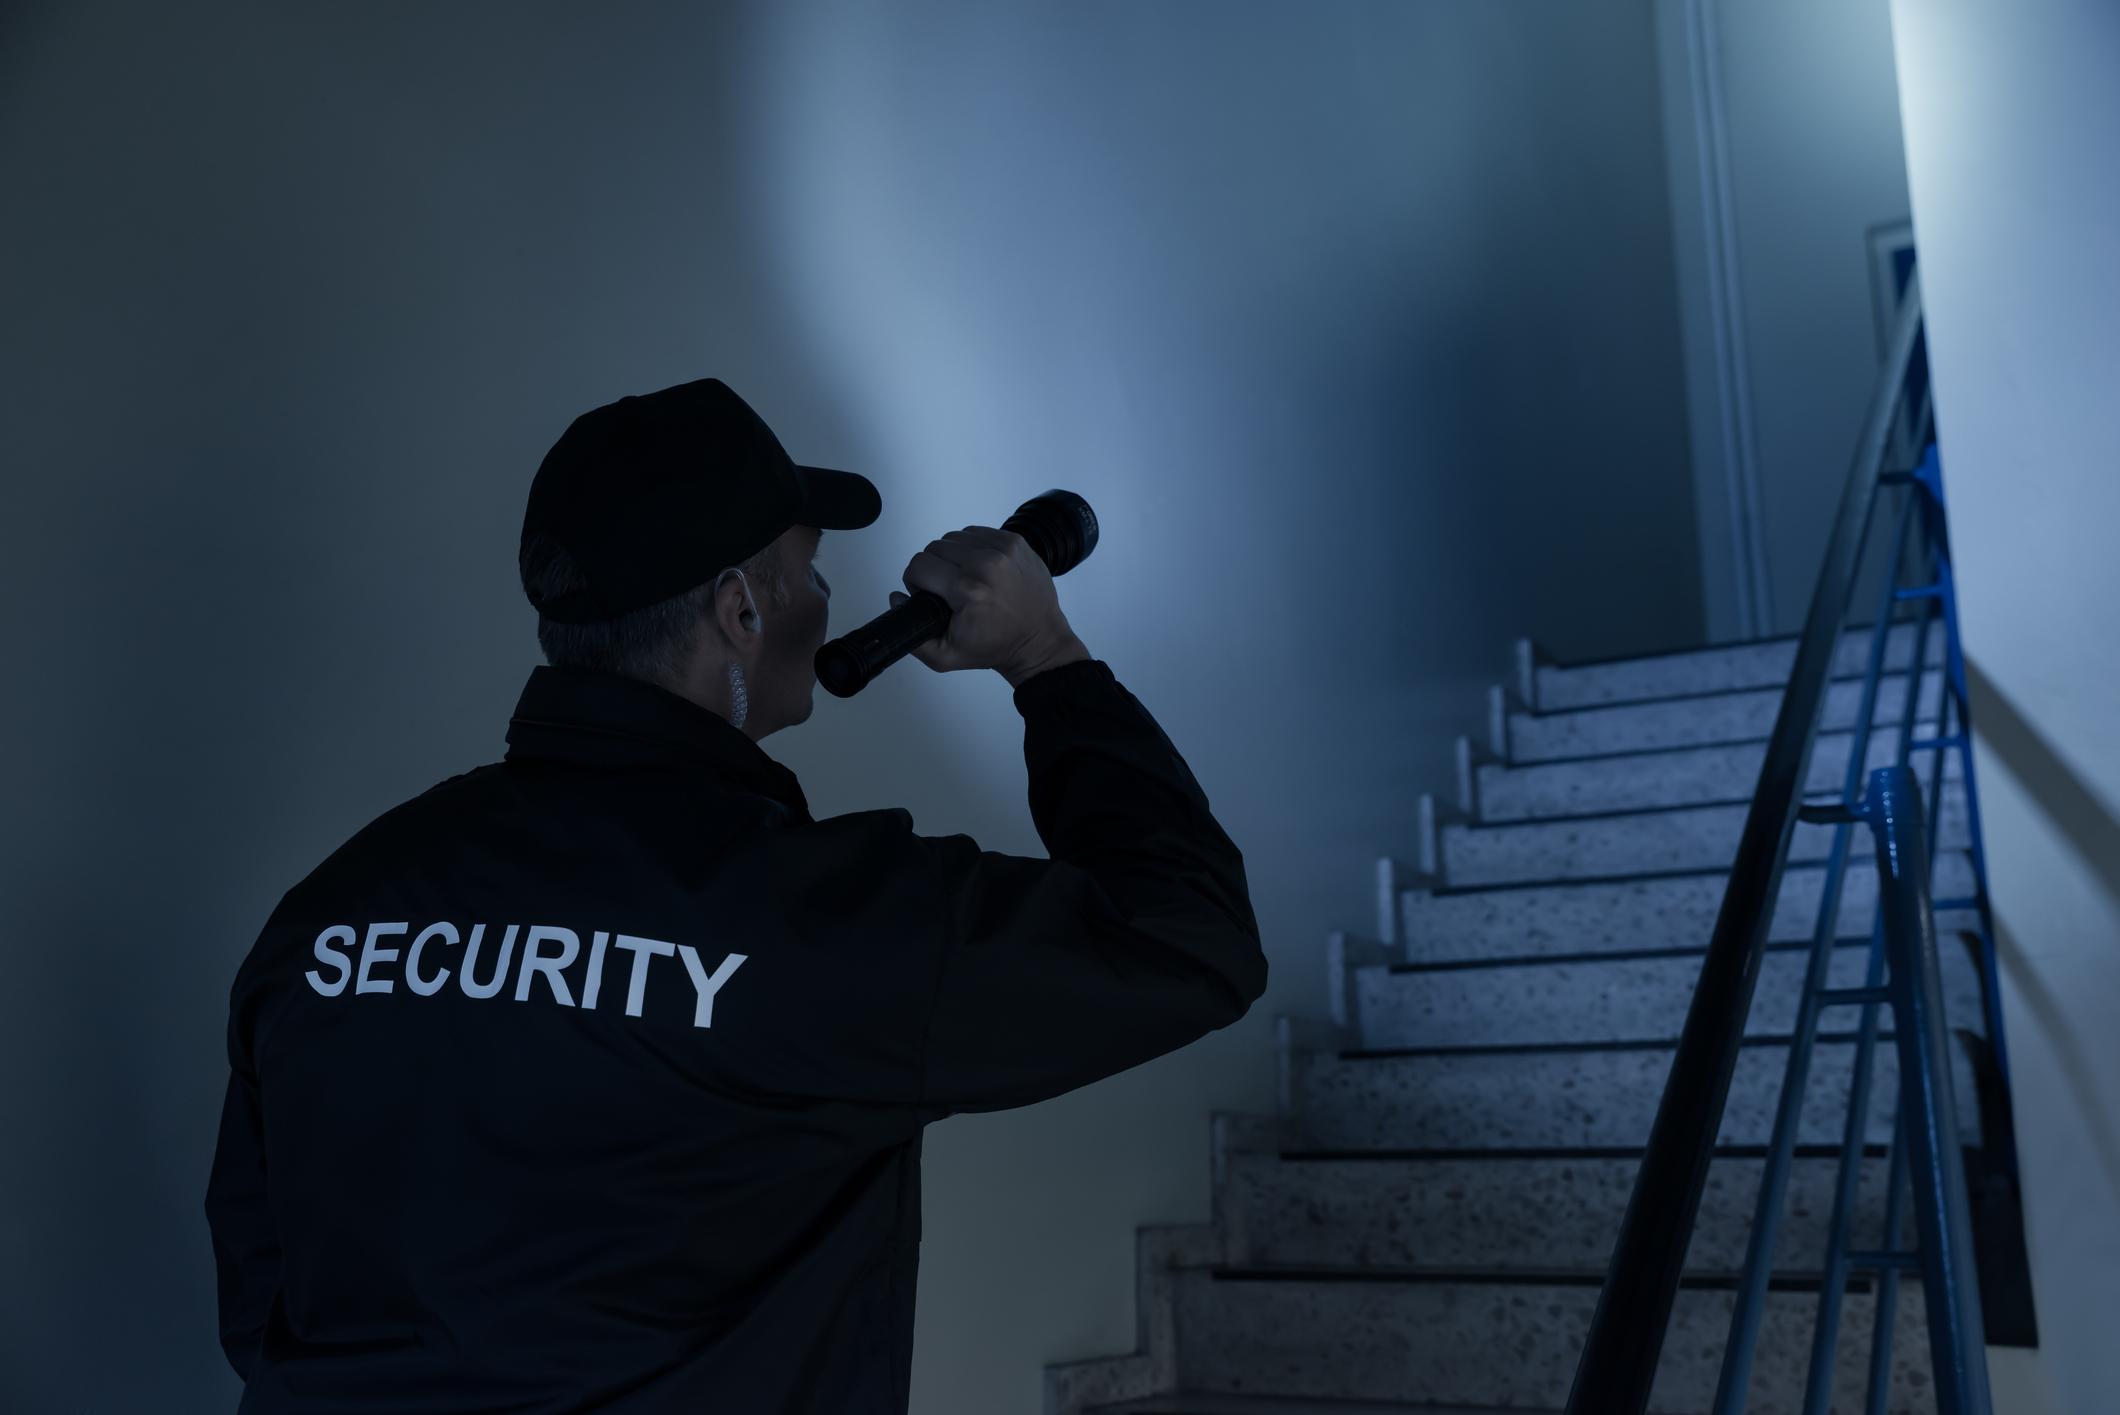 Uniformed security -